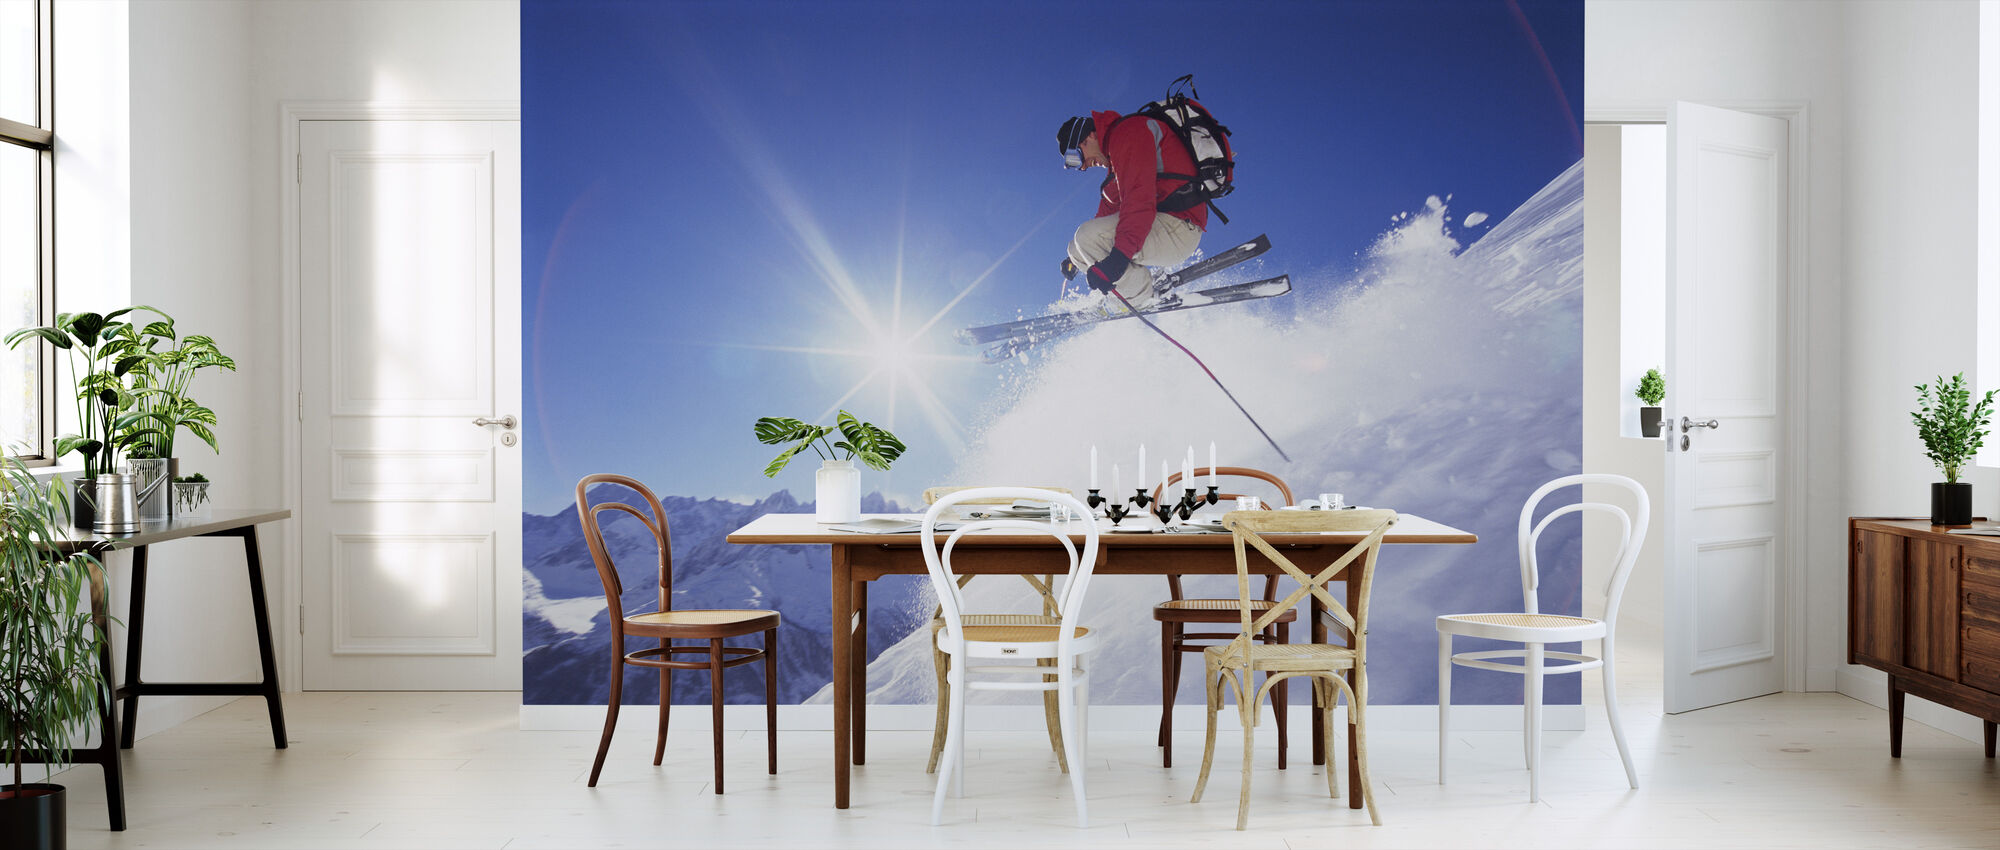 Adrenaline Skiing - Wallpaper - Kitchen